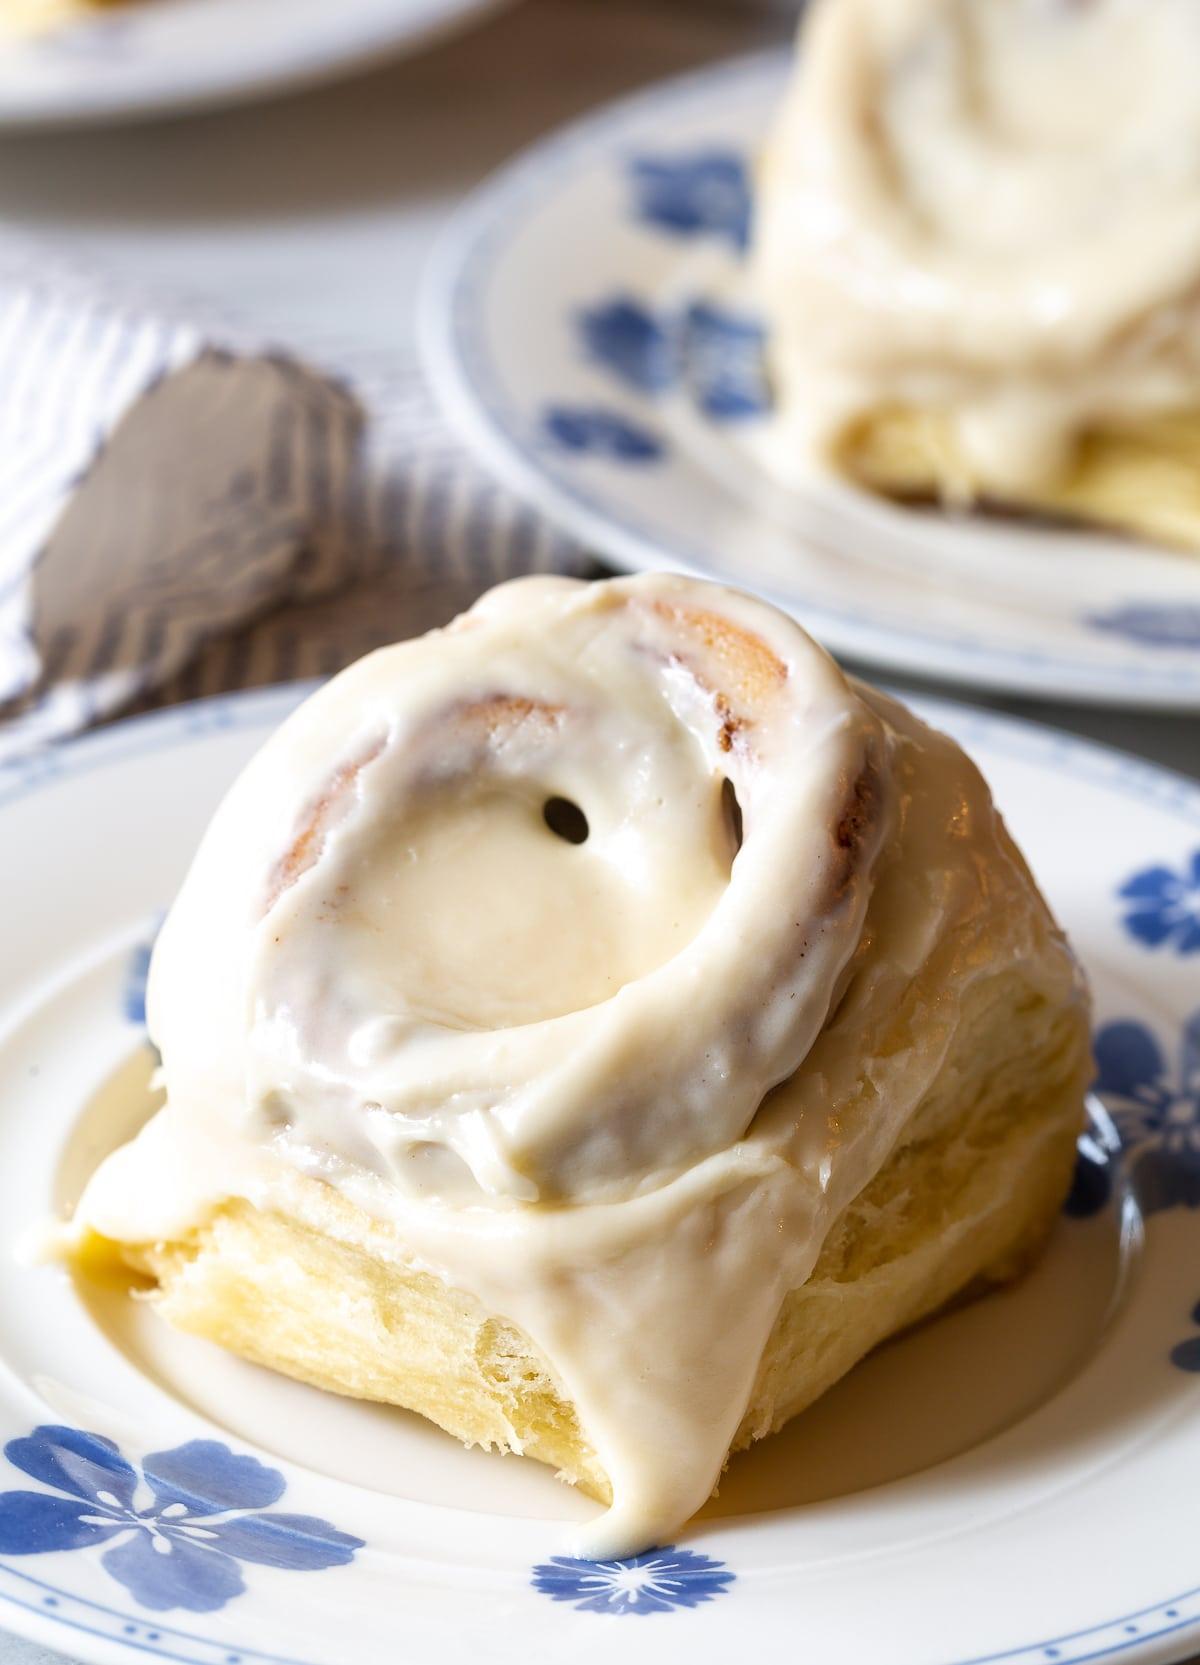 Cinnamon Roll Recipe #ASpicyPerspective #CinnamonRolls #CinnamonRollRecipe #HowtoMakeCinnamonRolls #Cinnabon #Dessert #Breakfast #Cinnamon #Homemade